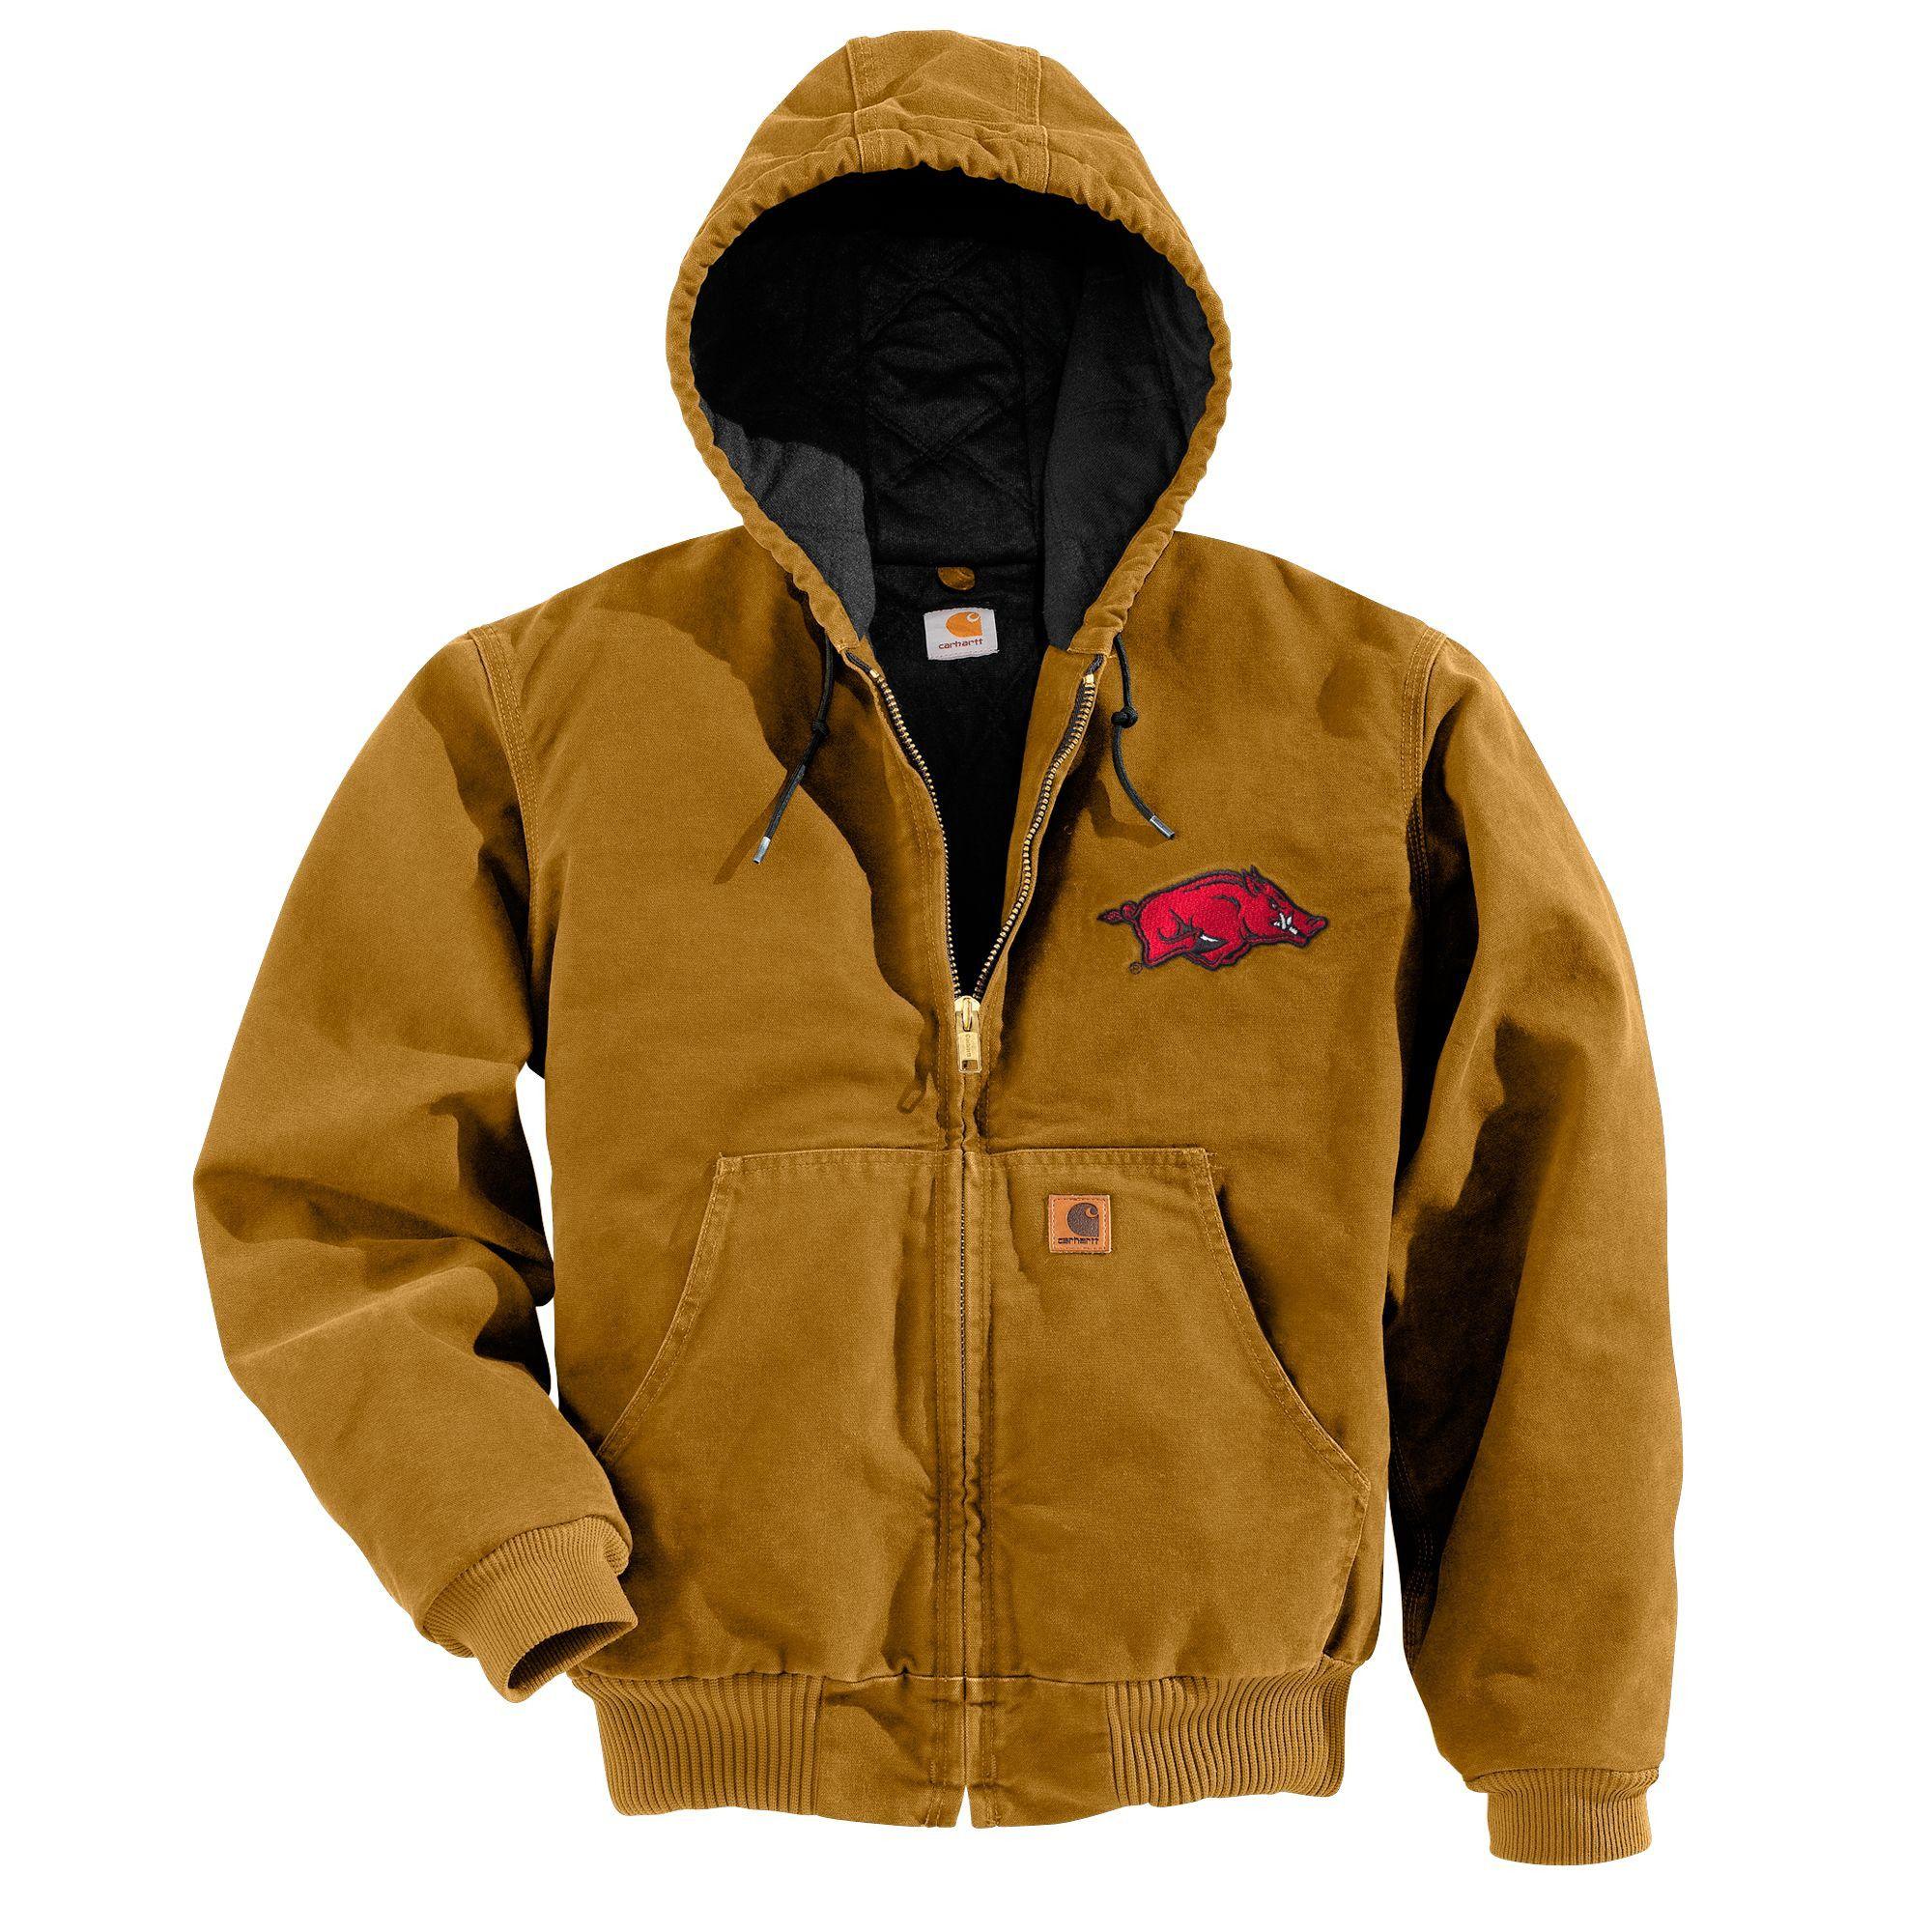 Mens hooded flannel jacket  Carhartt Mens Fayetteville QFL Sandstone Active Jkt  Carhartt